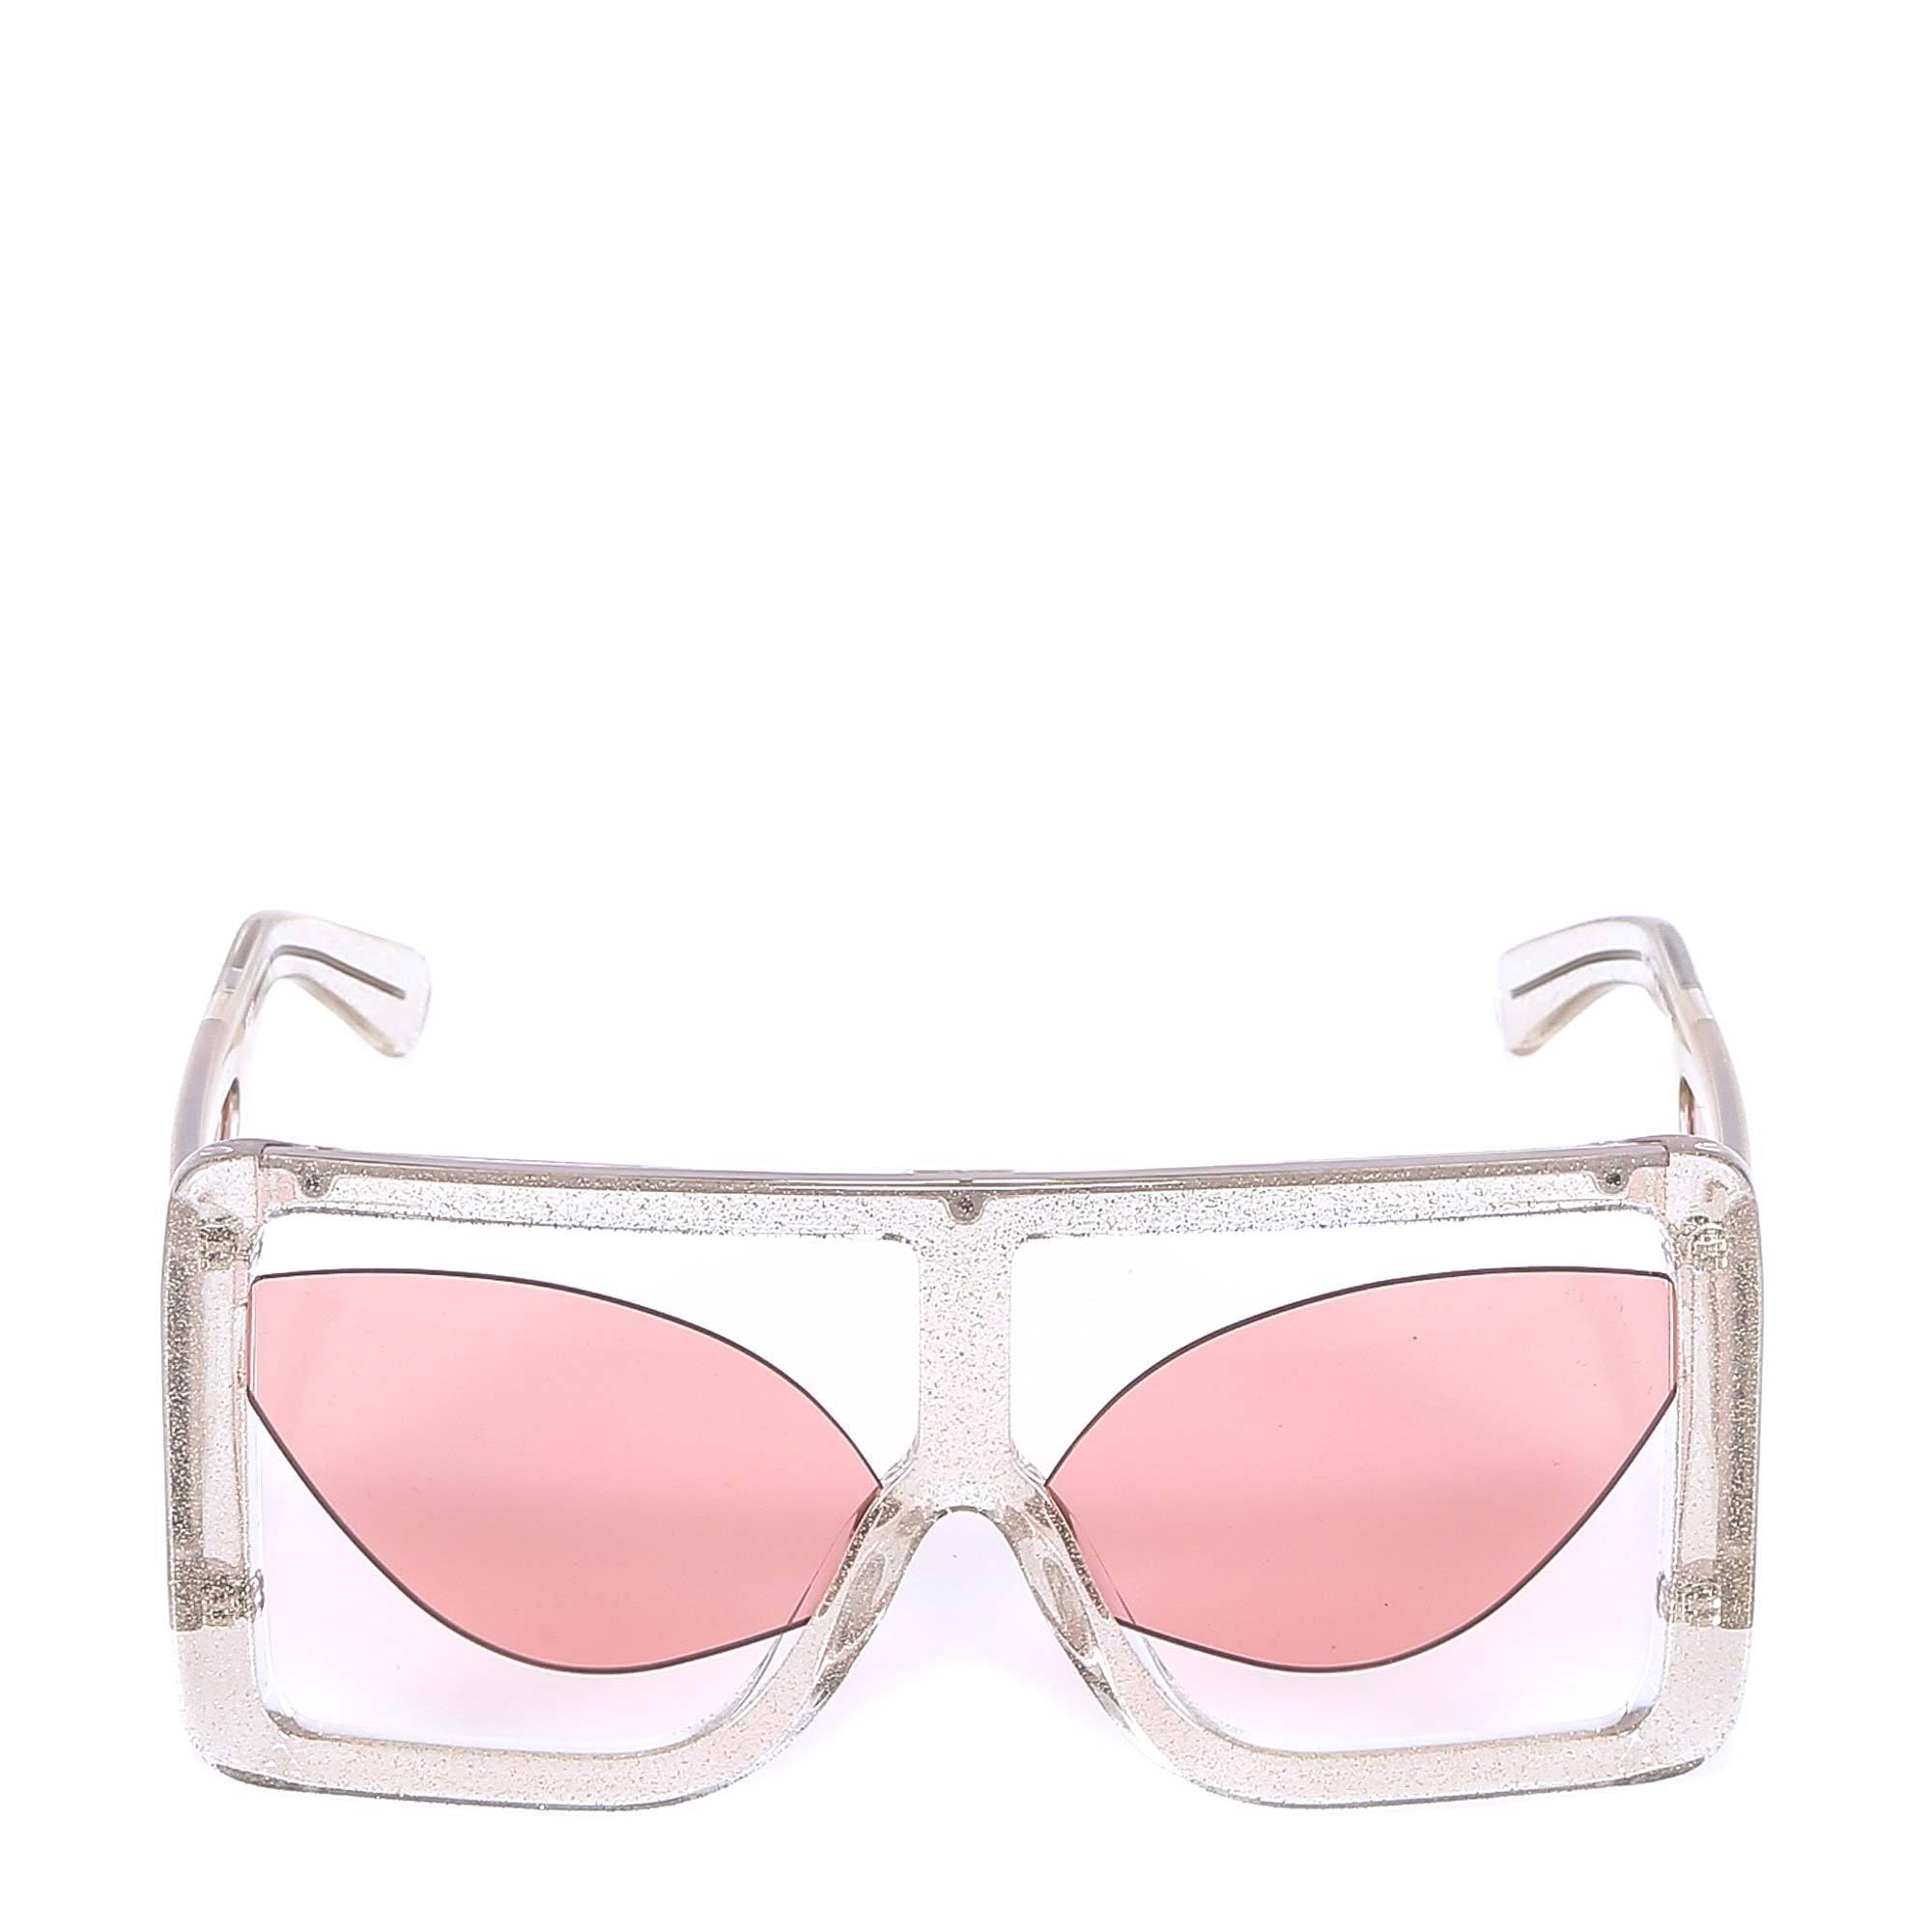 70f9272eeaa Gcds Oversized Frame Sunglasses in Pink - Lyst